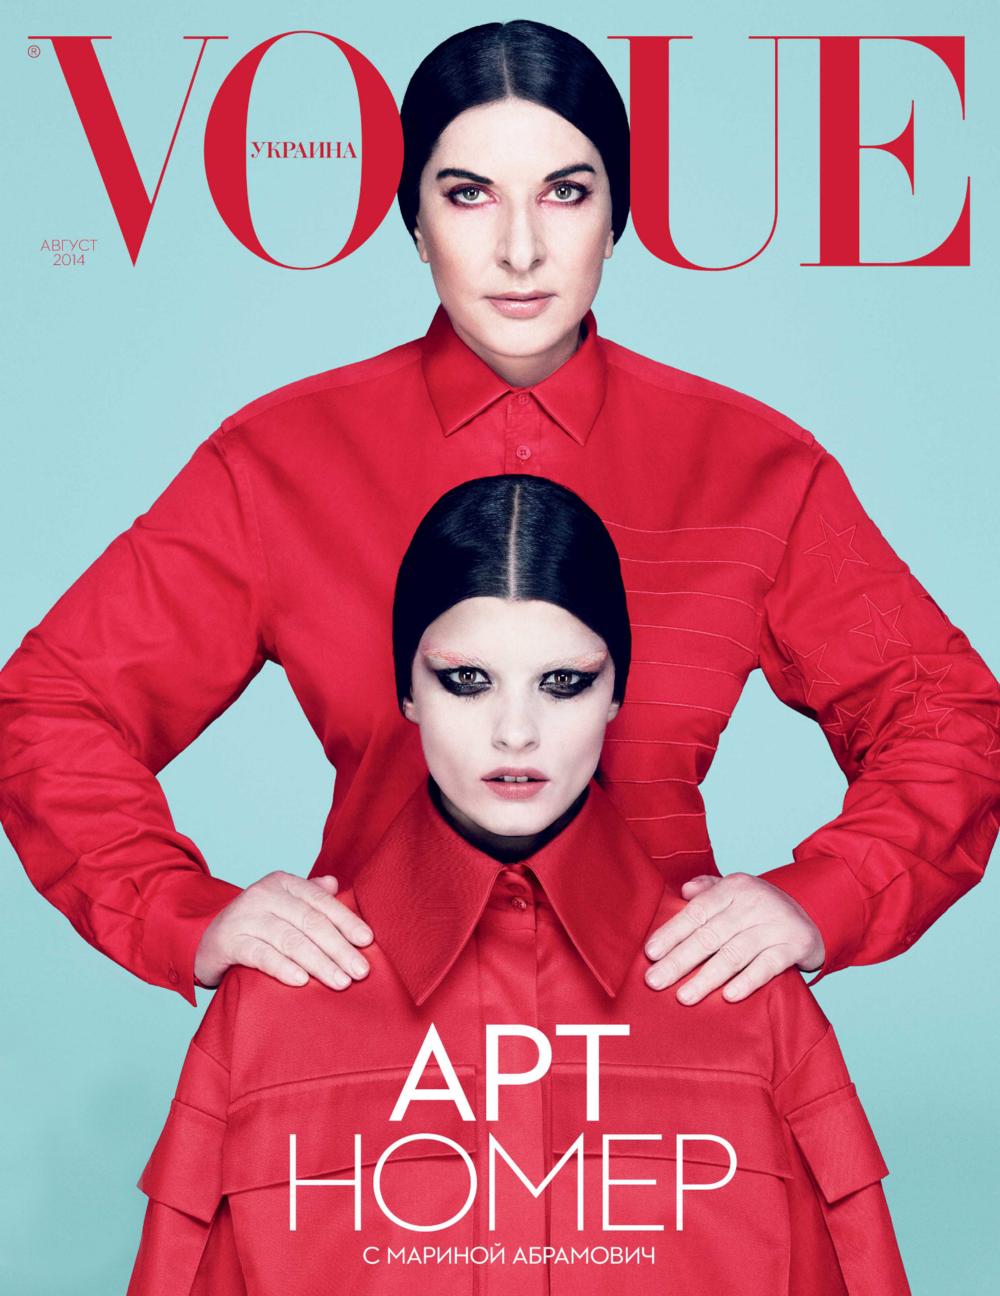 Vogue Ukraine by Dusan Reljin